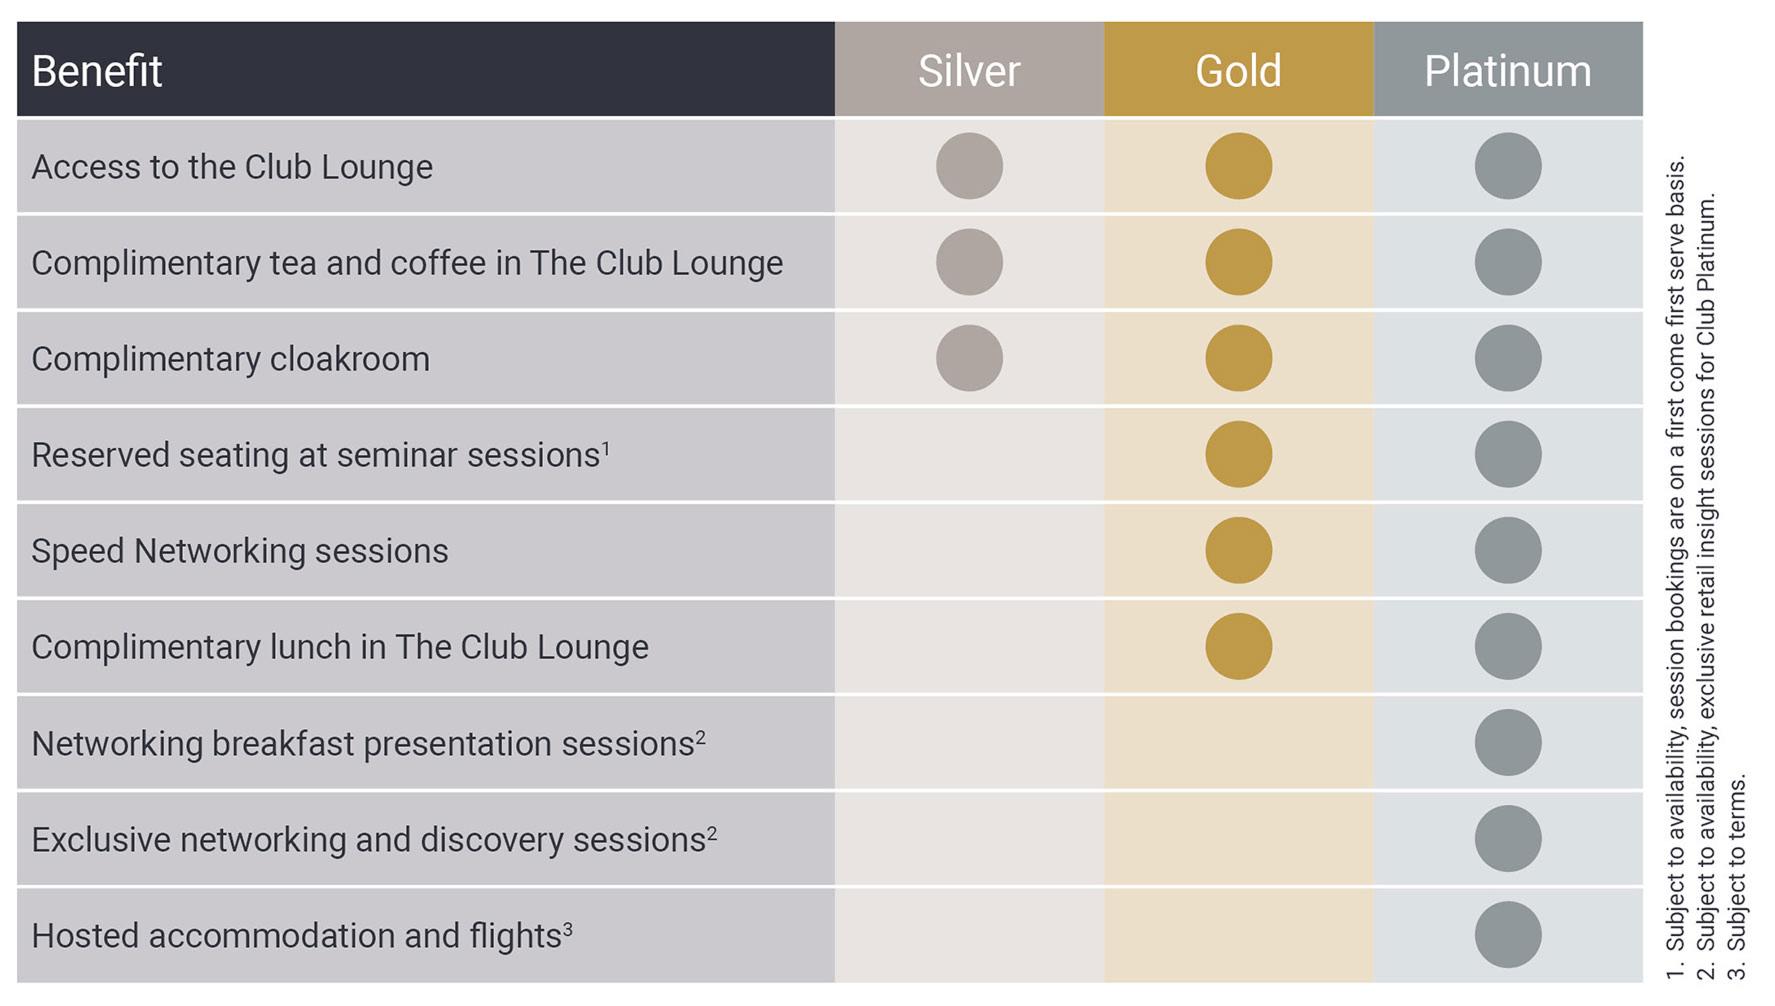 Spring Fair The Club Benefits Table